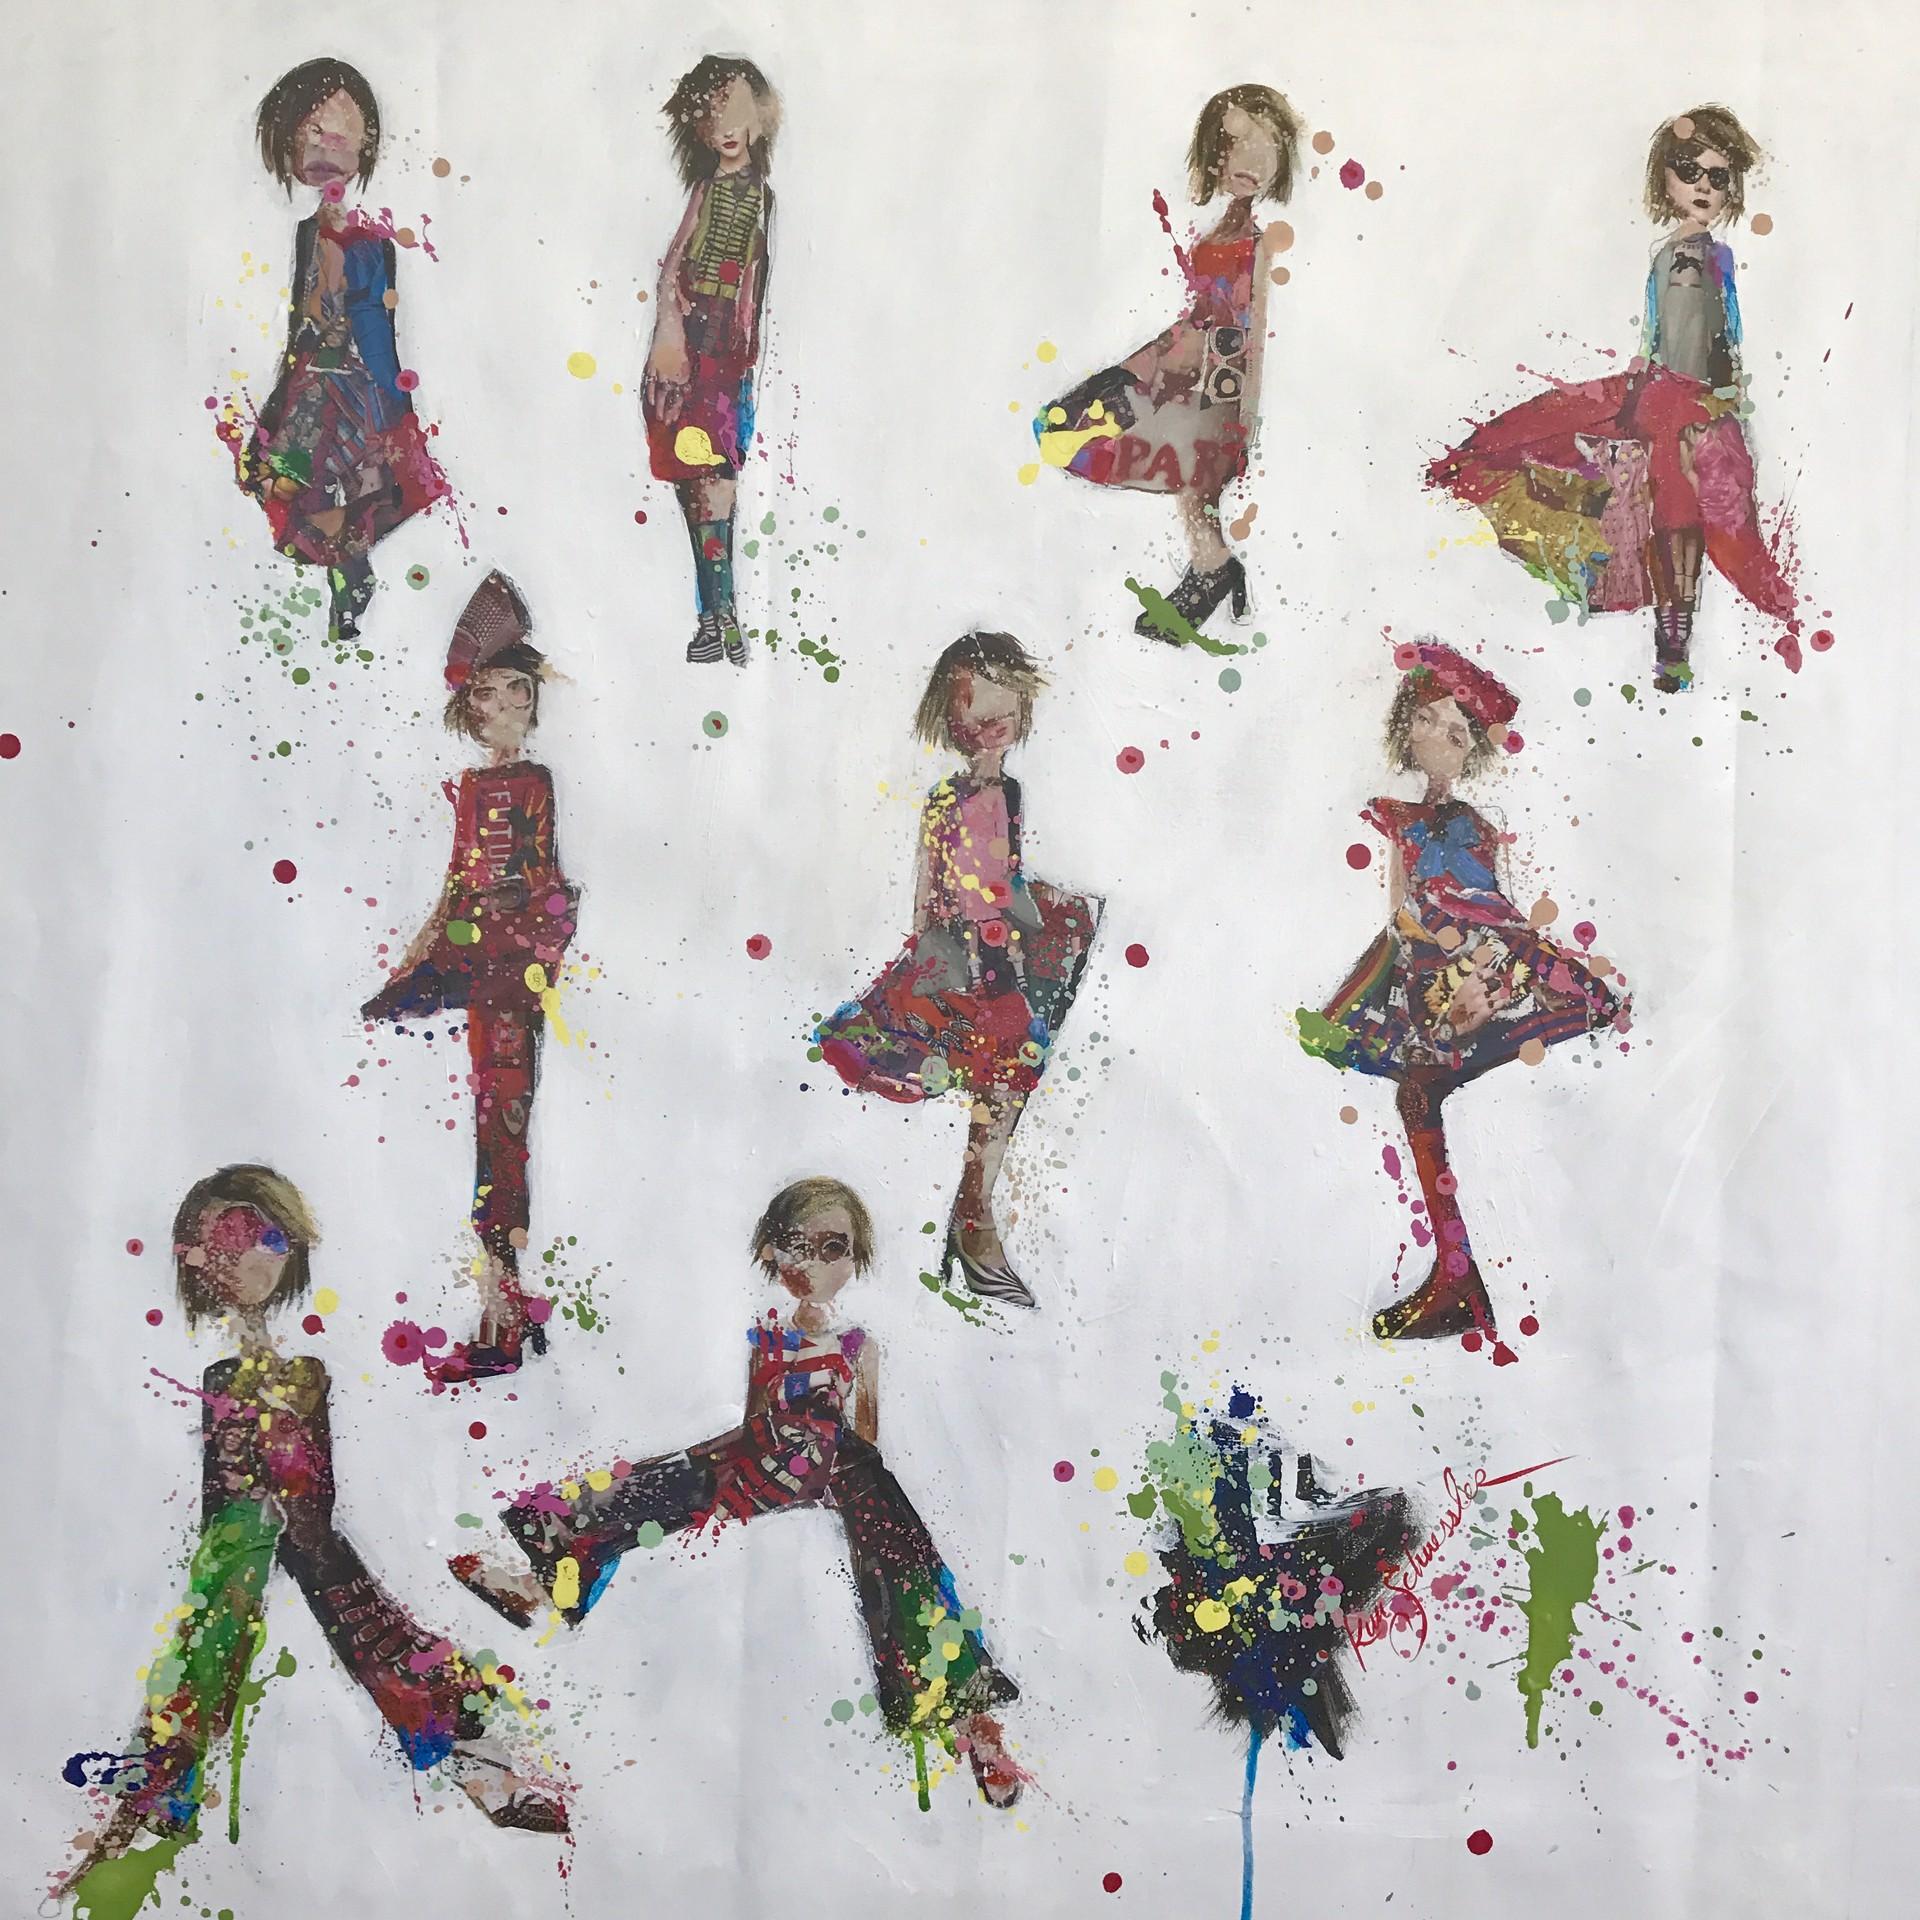 Gucci Girls by Kim Schuessler